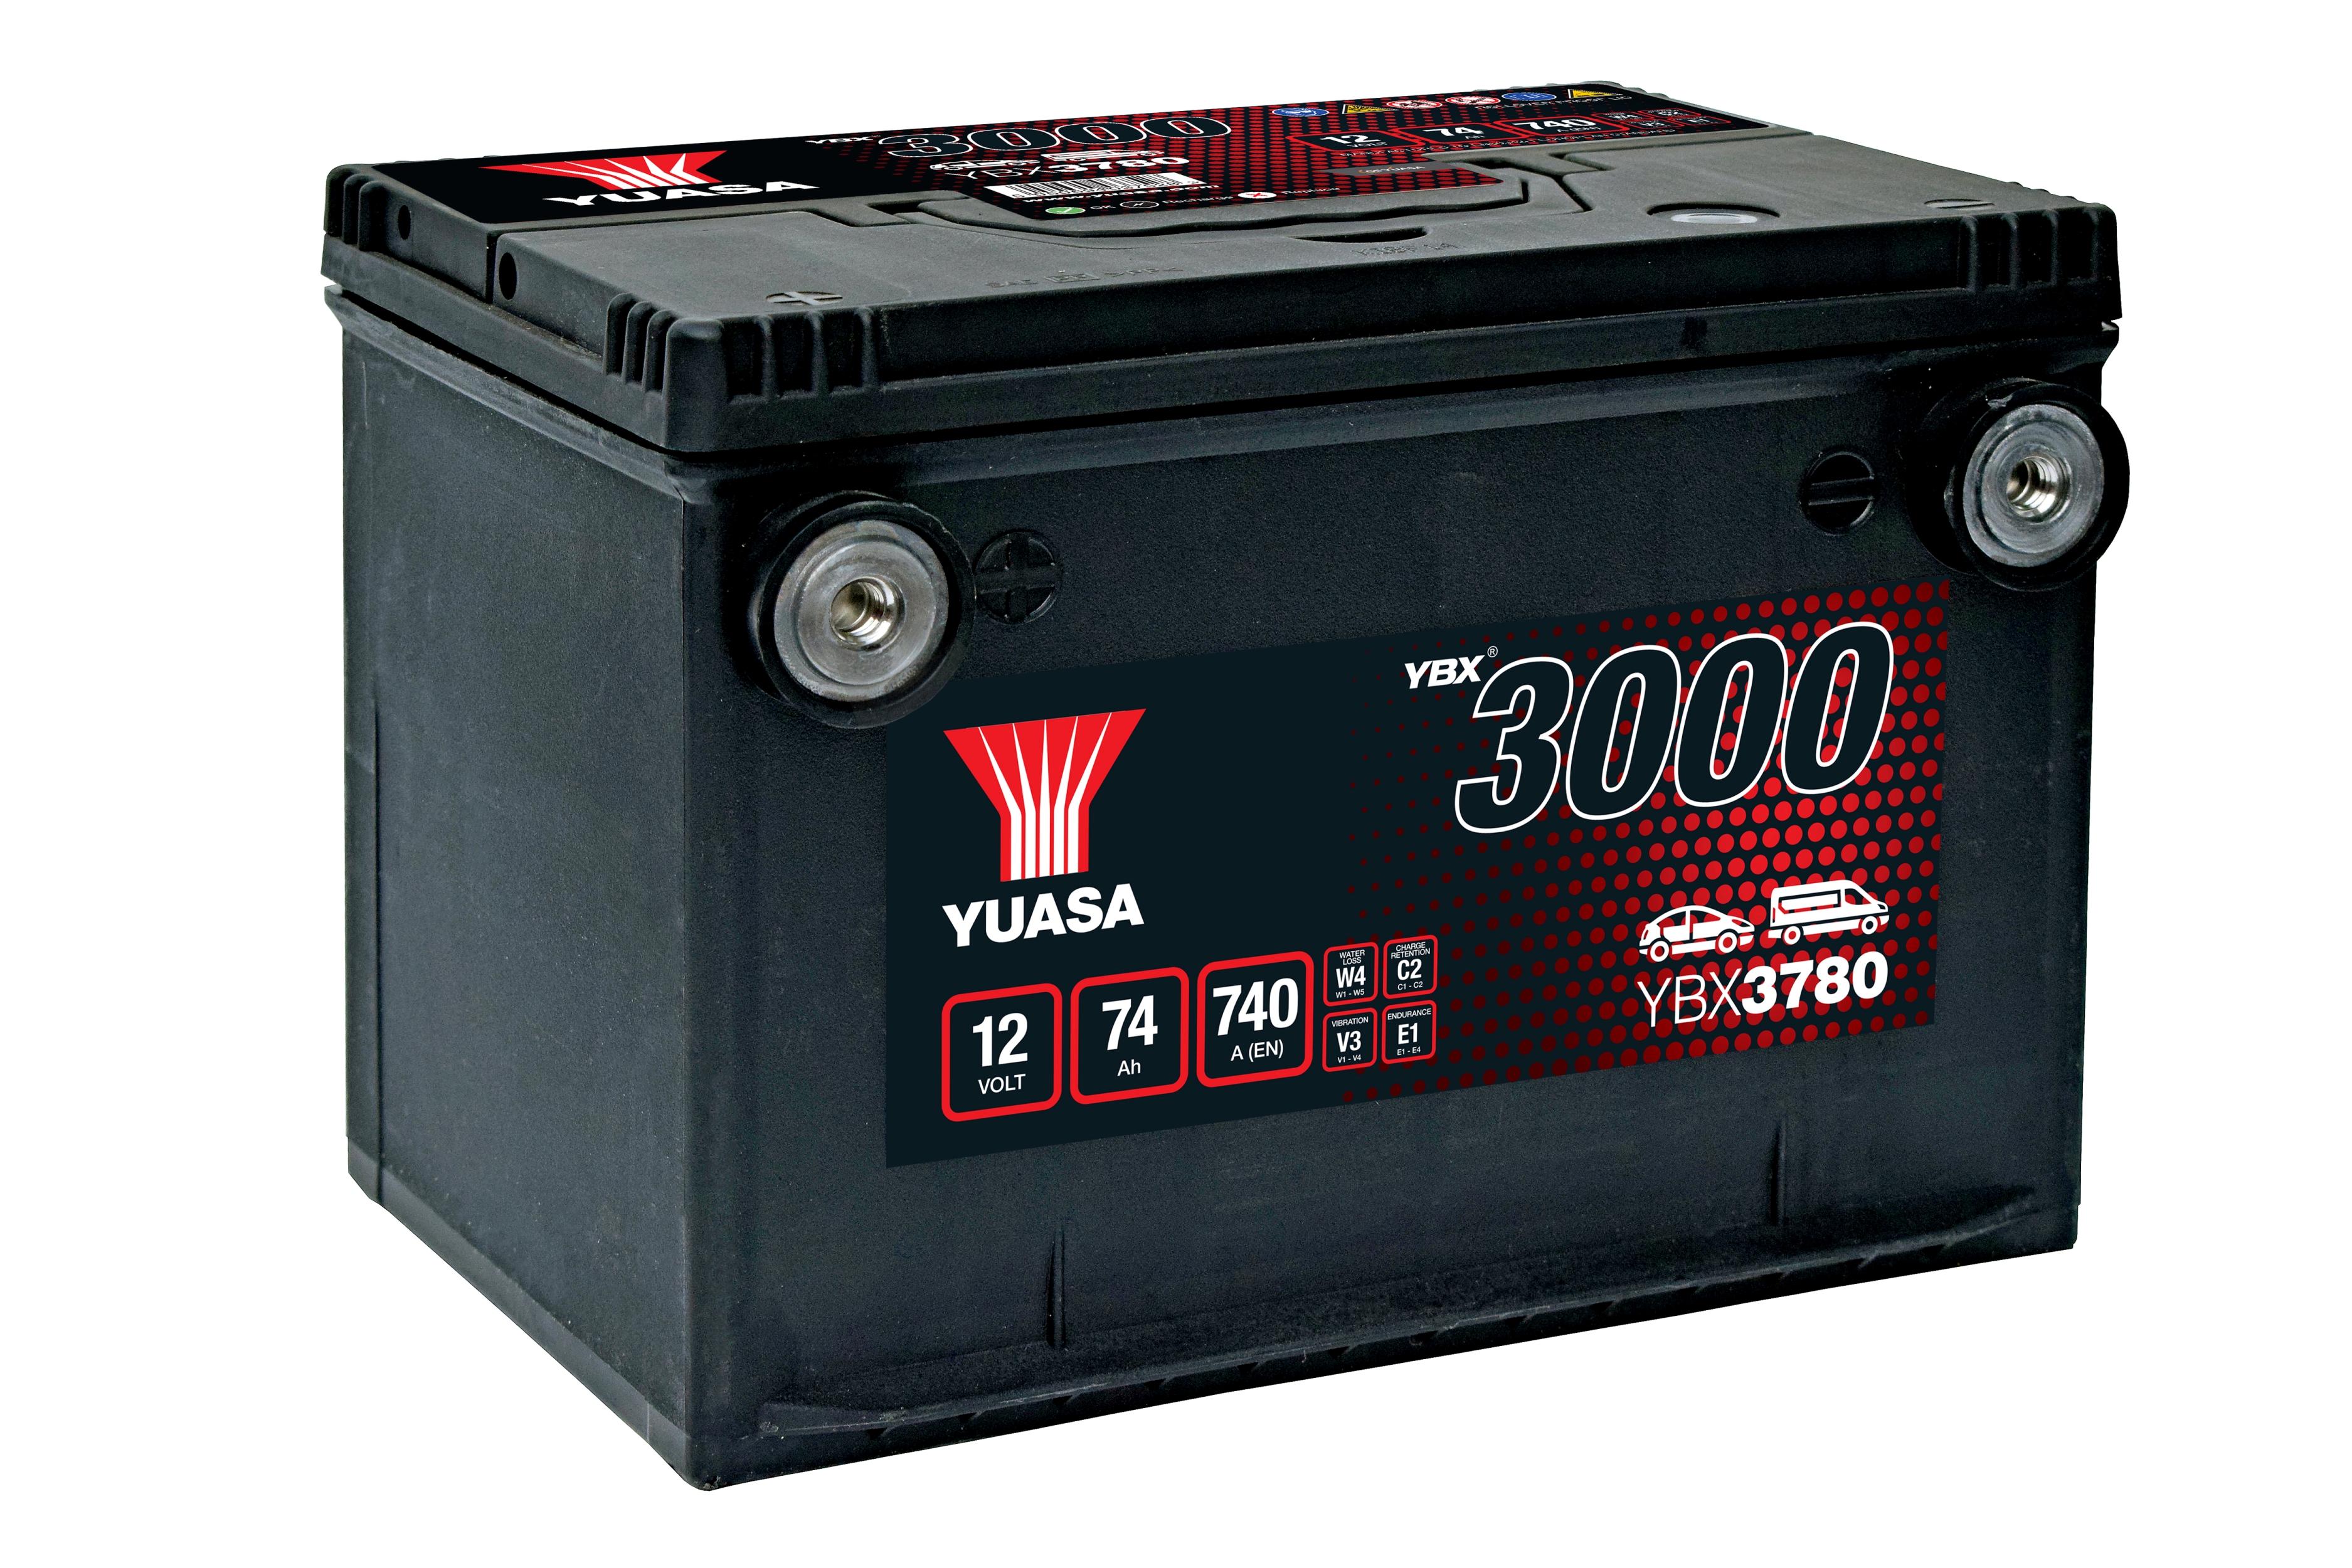 YBX3780 12V 74Ah 740A Yuasa SMF Battery